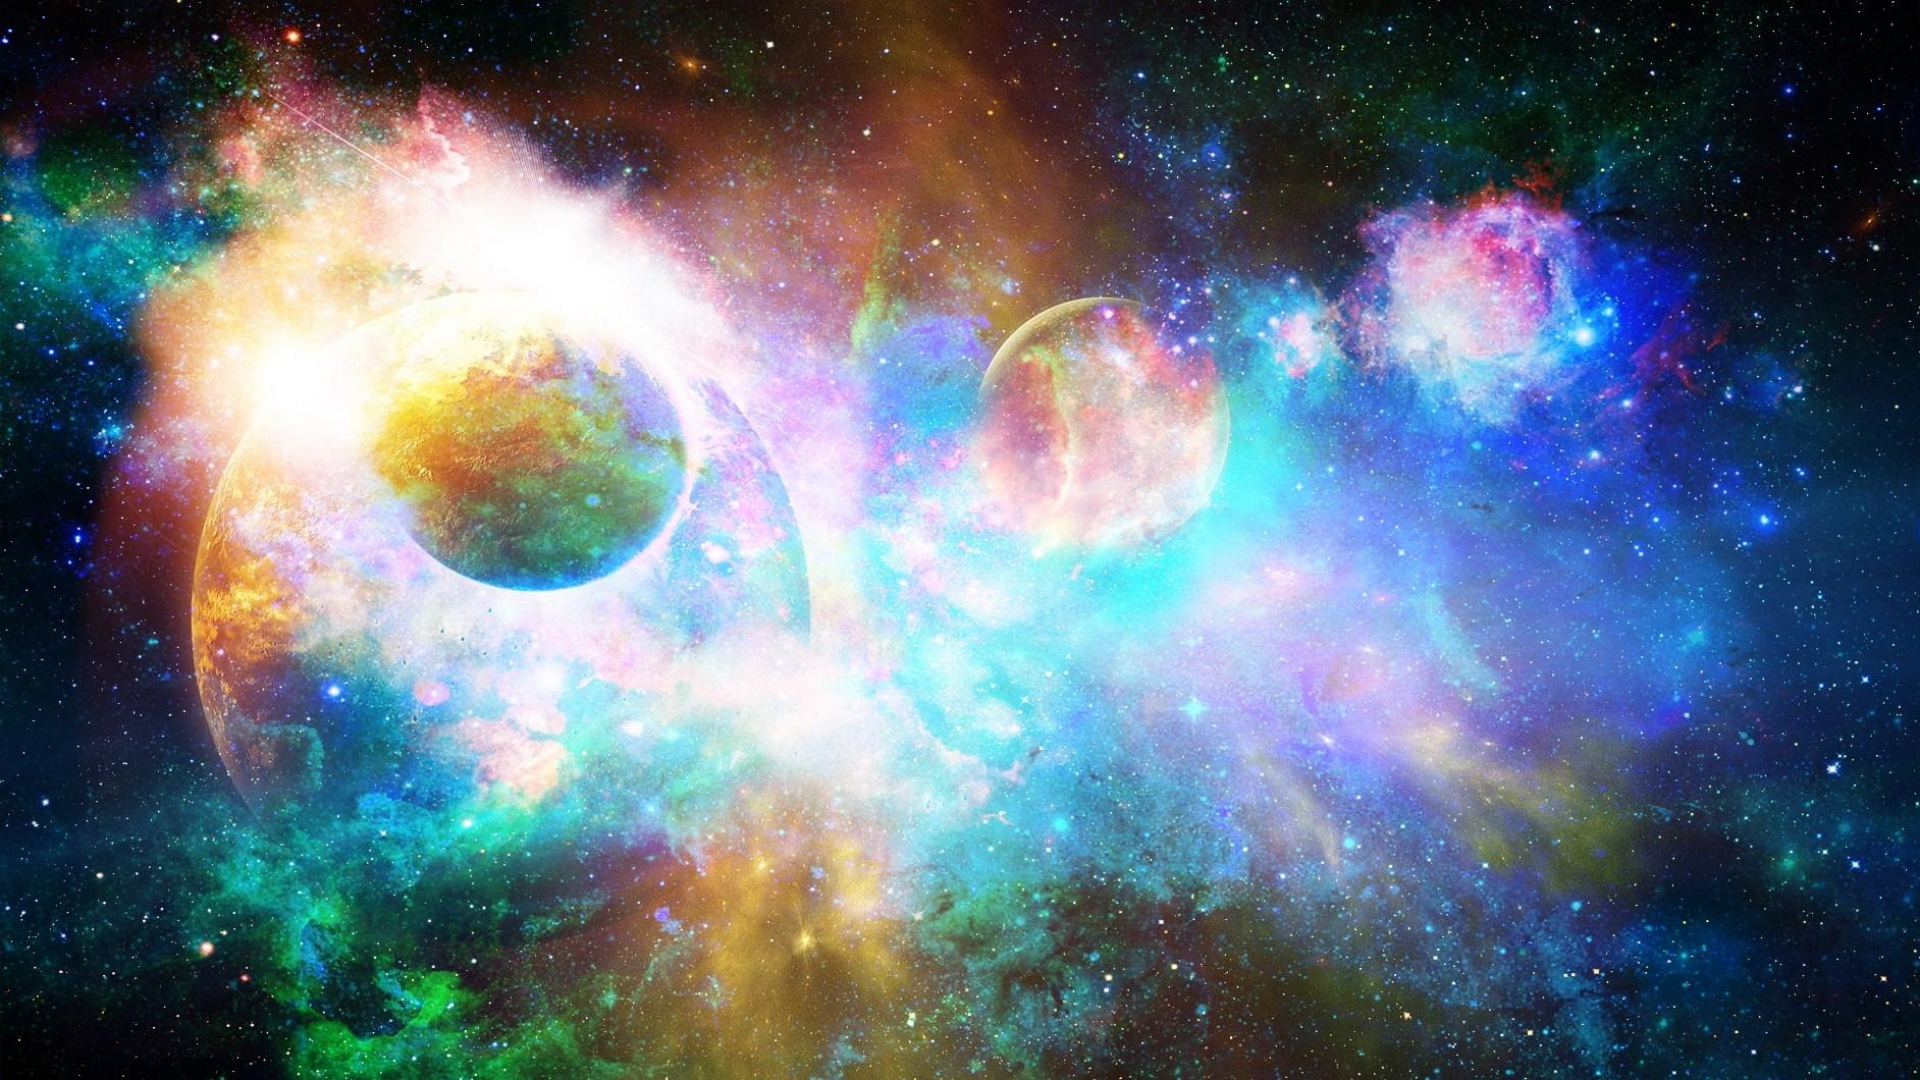 Download Wallpaper 1920x1080 Stars Planets Light Galaxy Universe